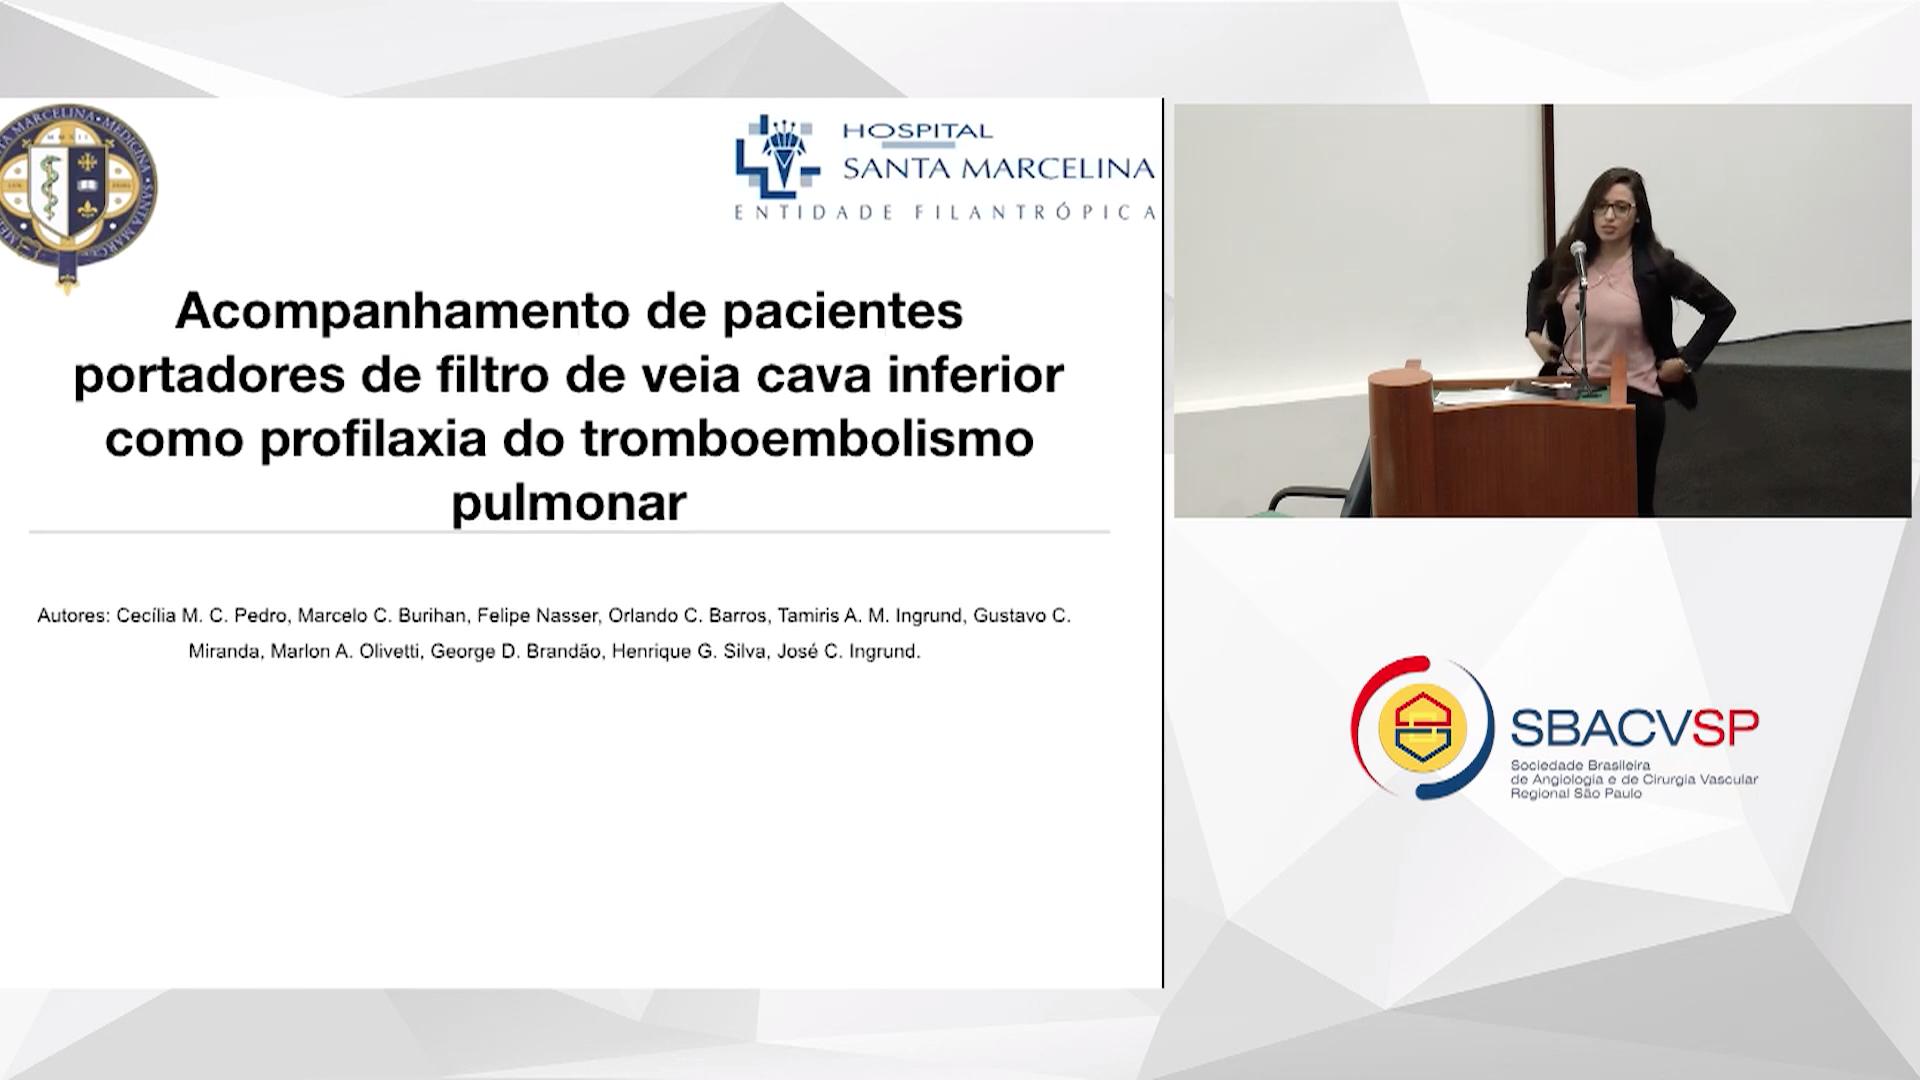 Tratamento fármaco-mecânico de flegmasia cerúlea dolens de membro superior: relato de caso